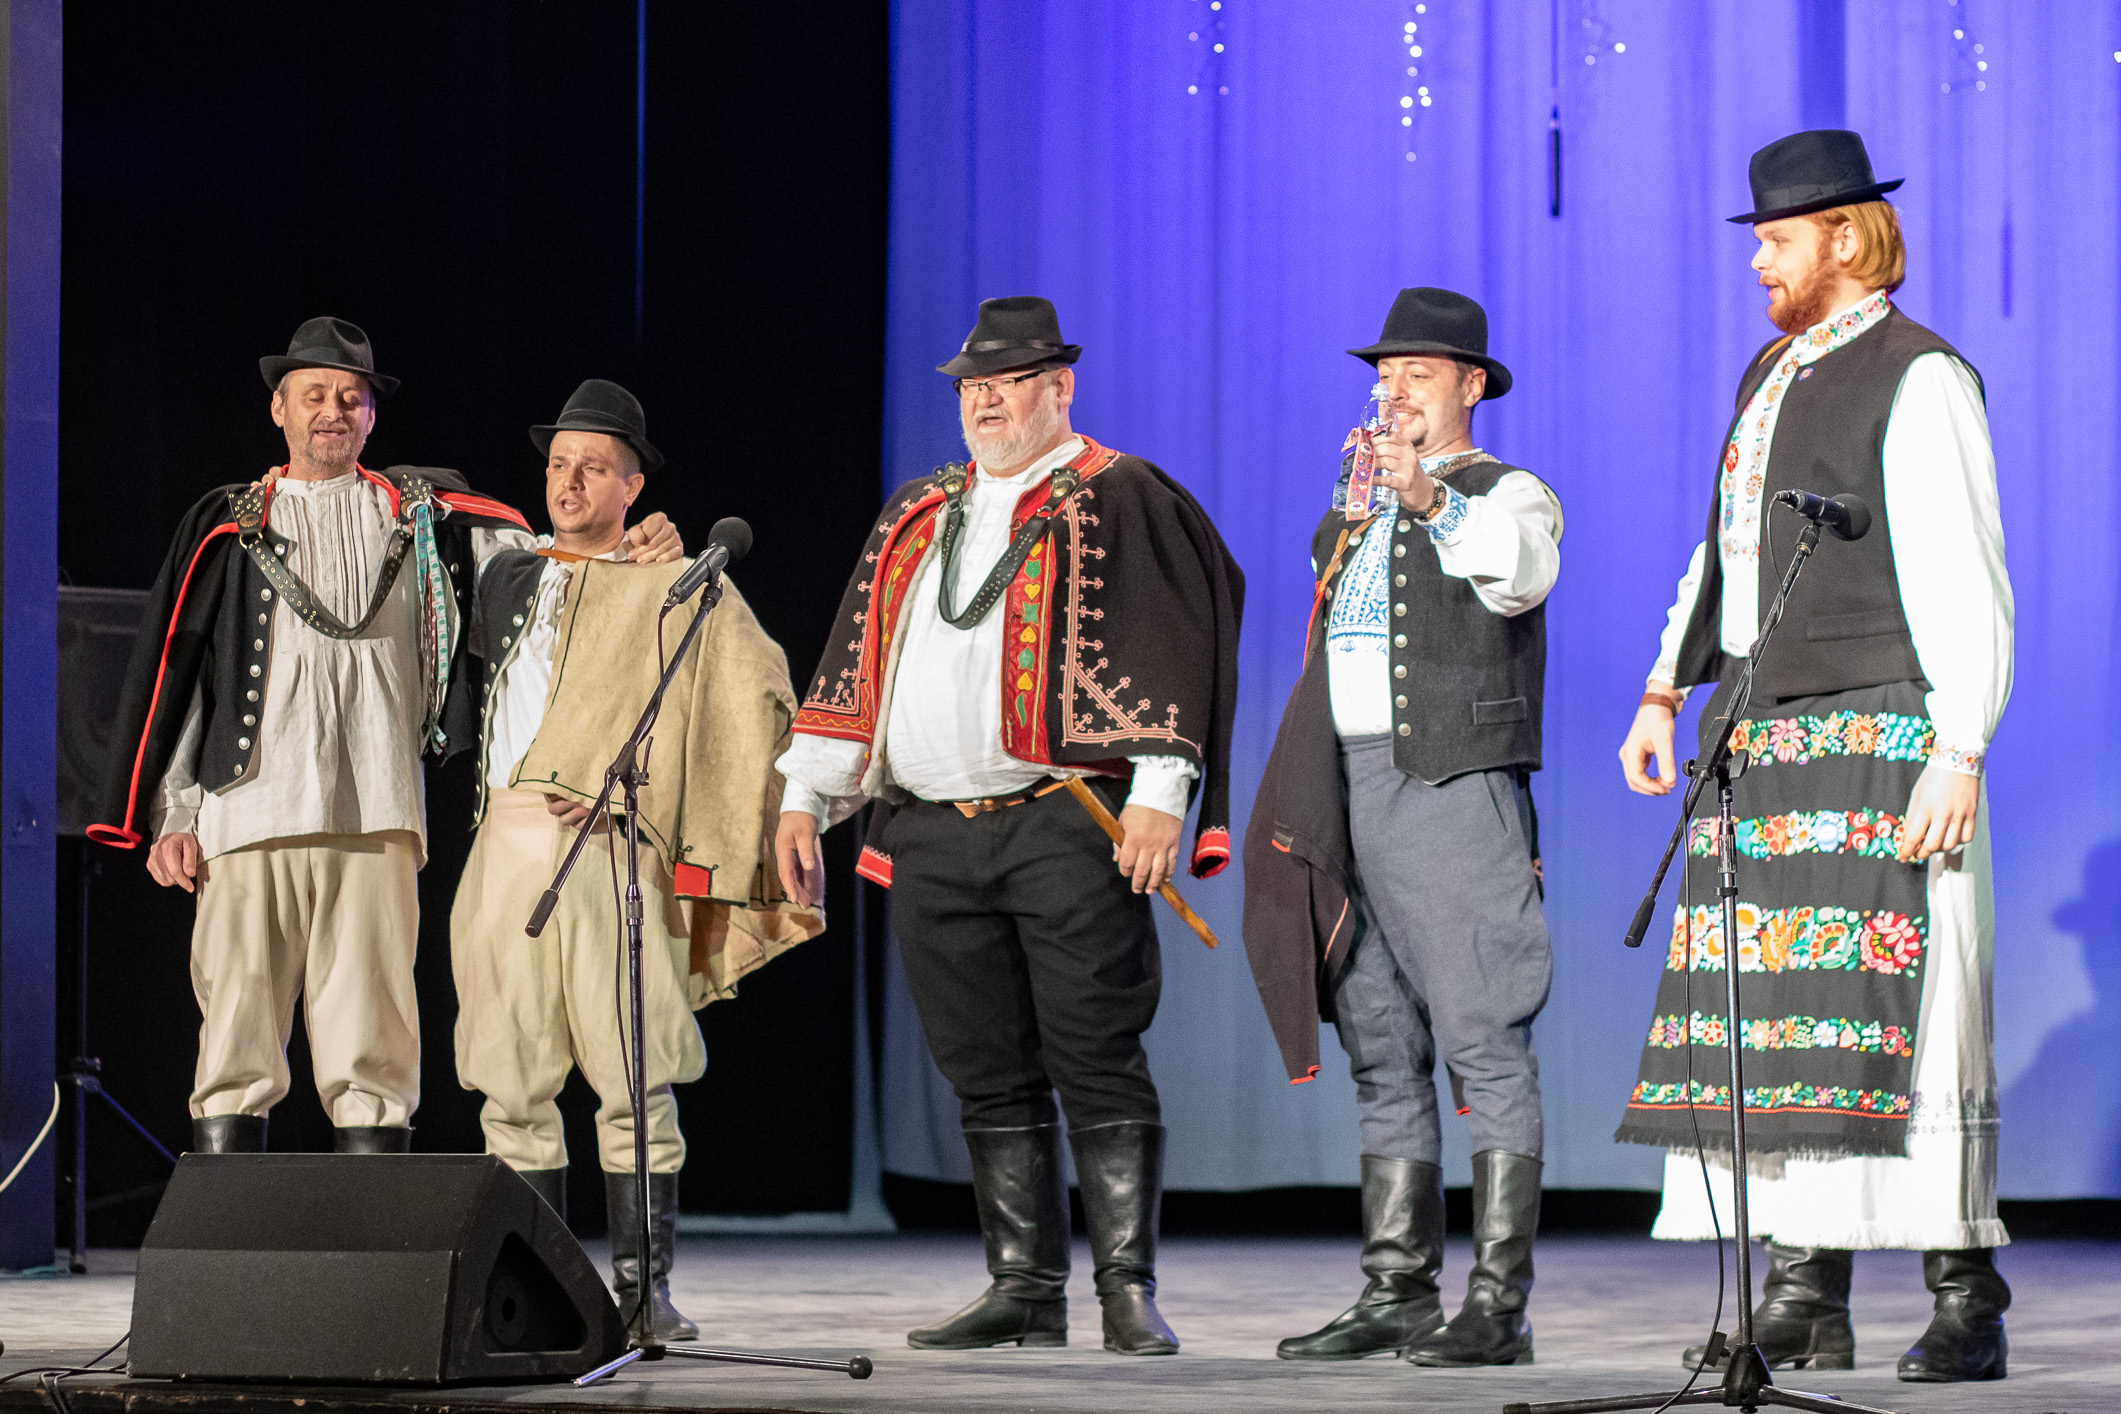 nadych-vianoc-zornicka-marina-33